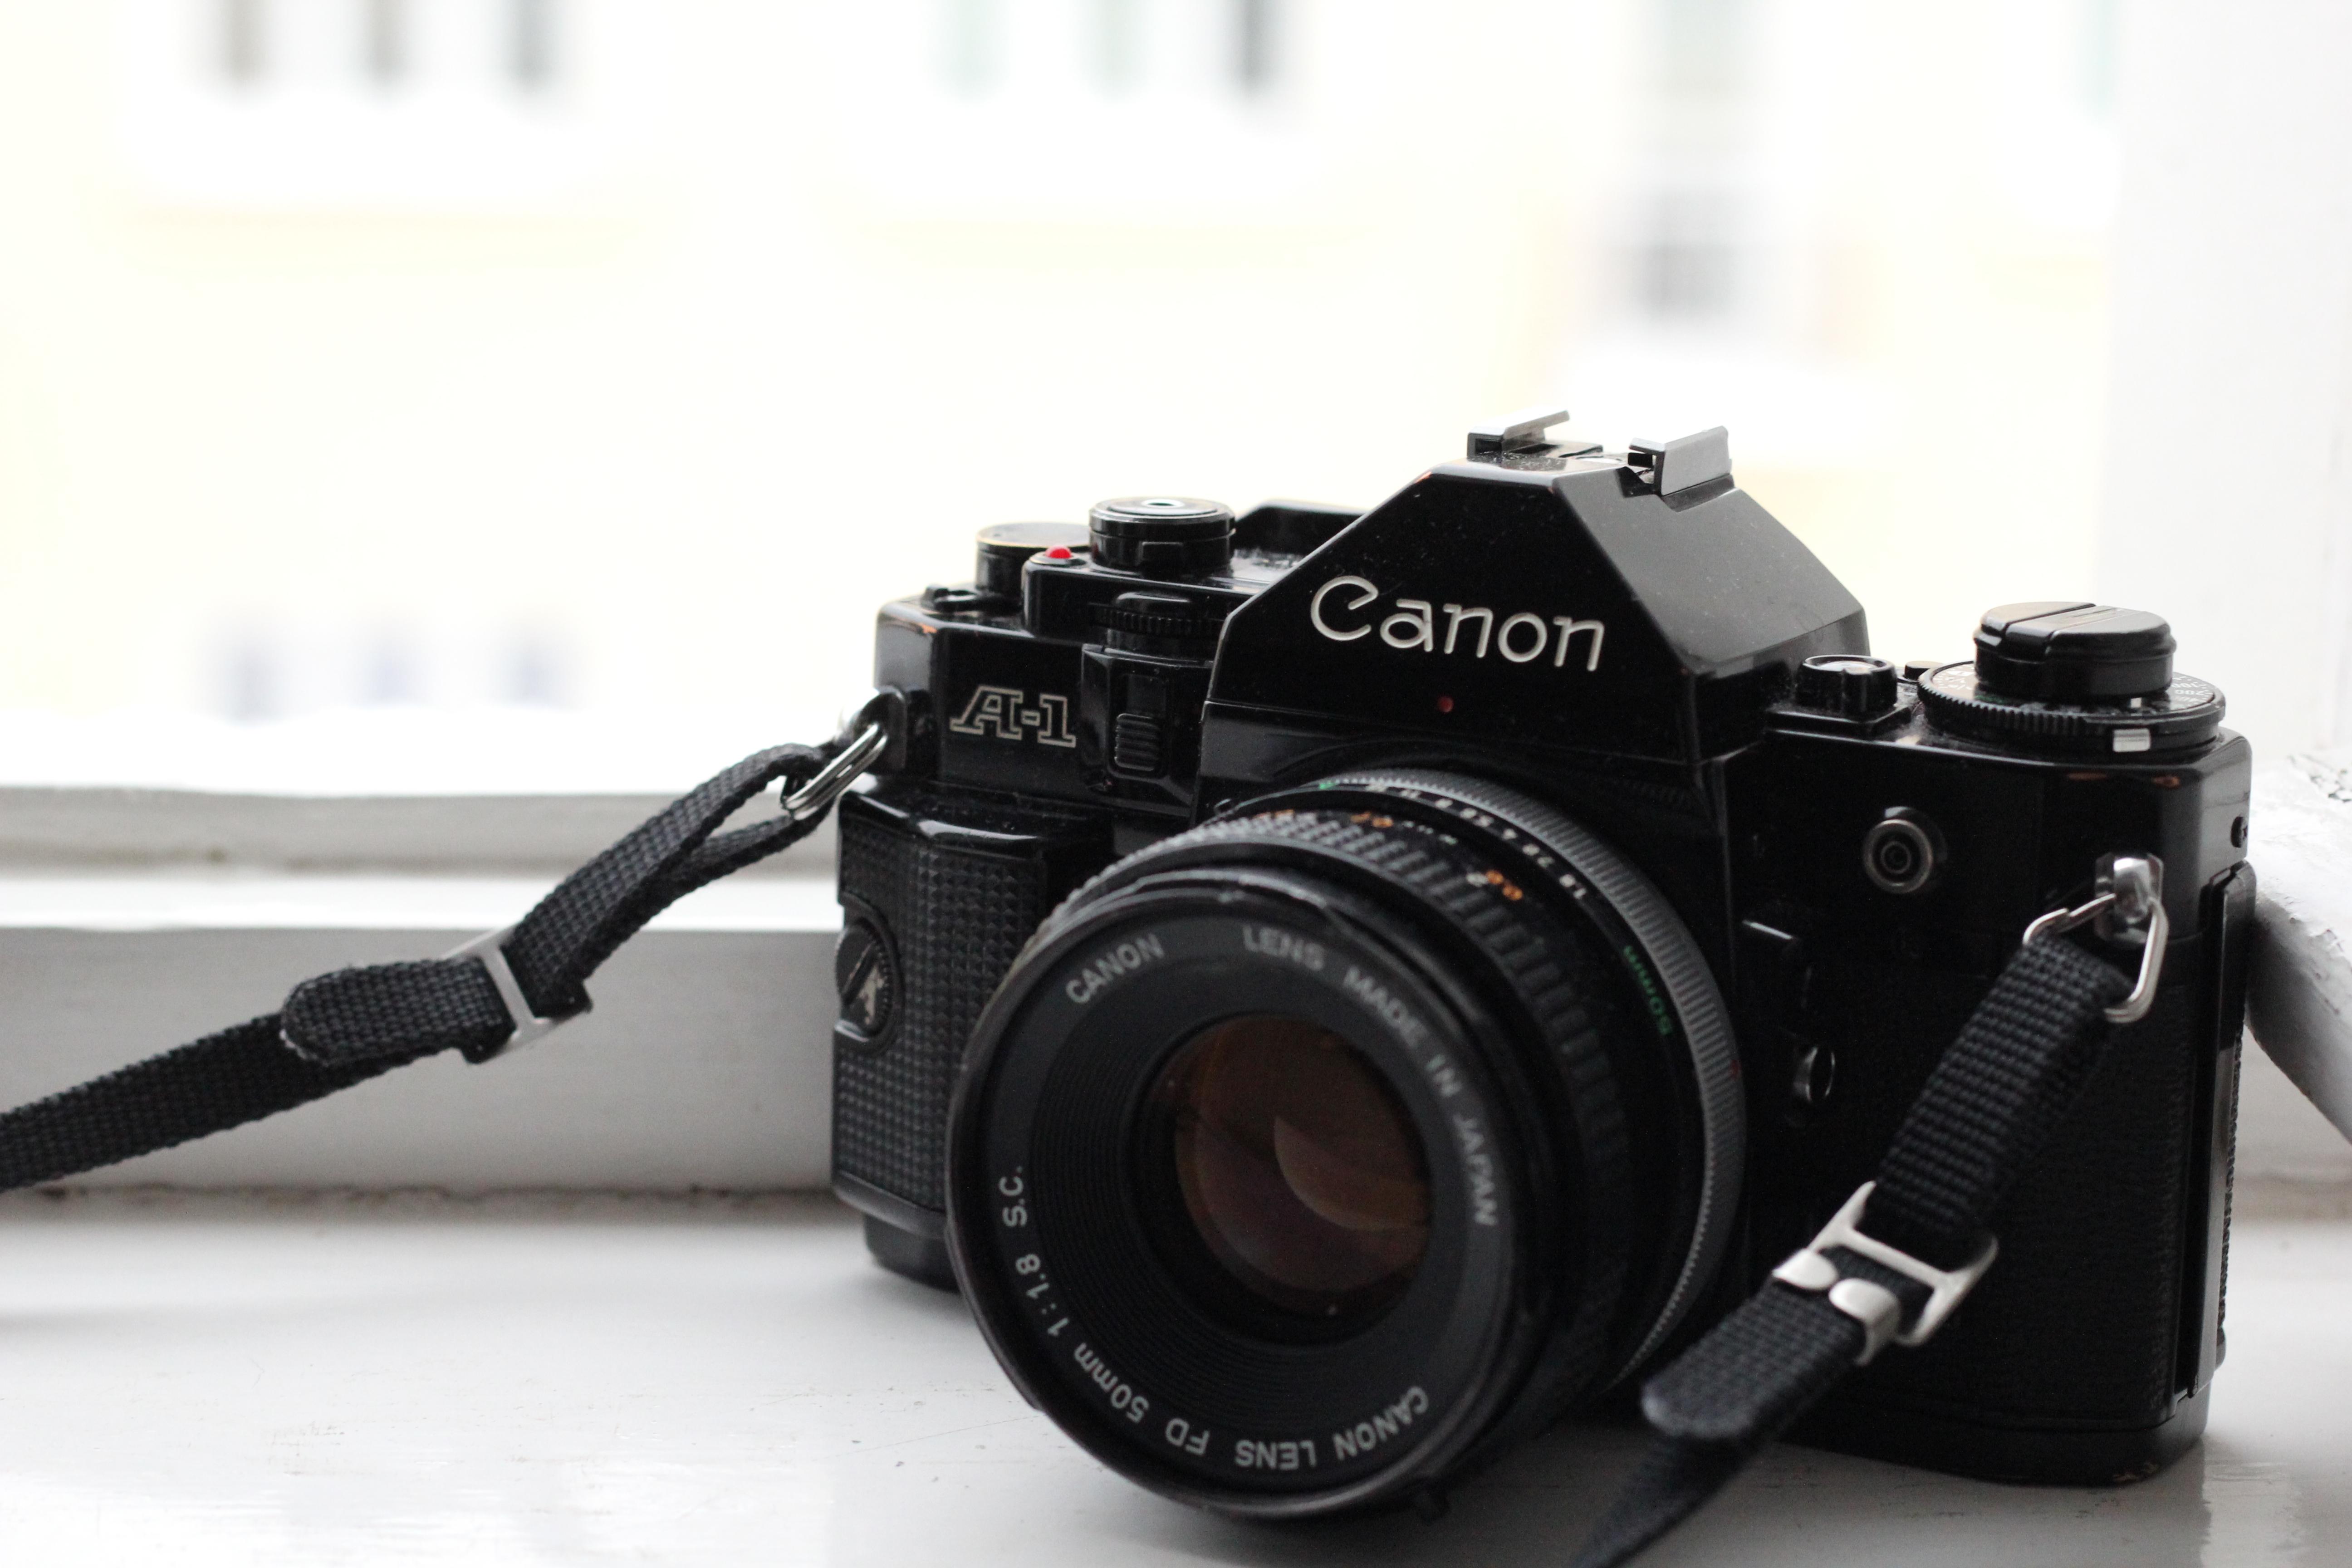 The Canon A-1 (Pic: Veronika Exnerova)